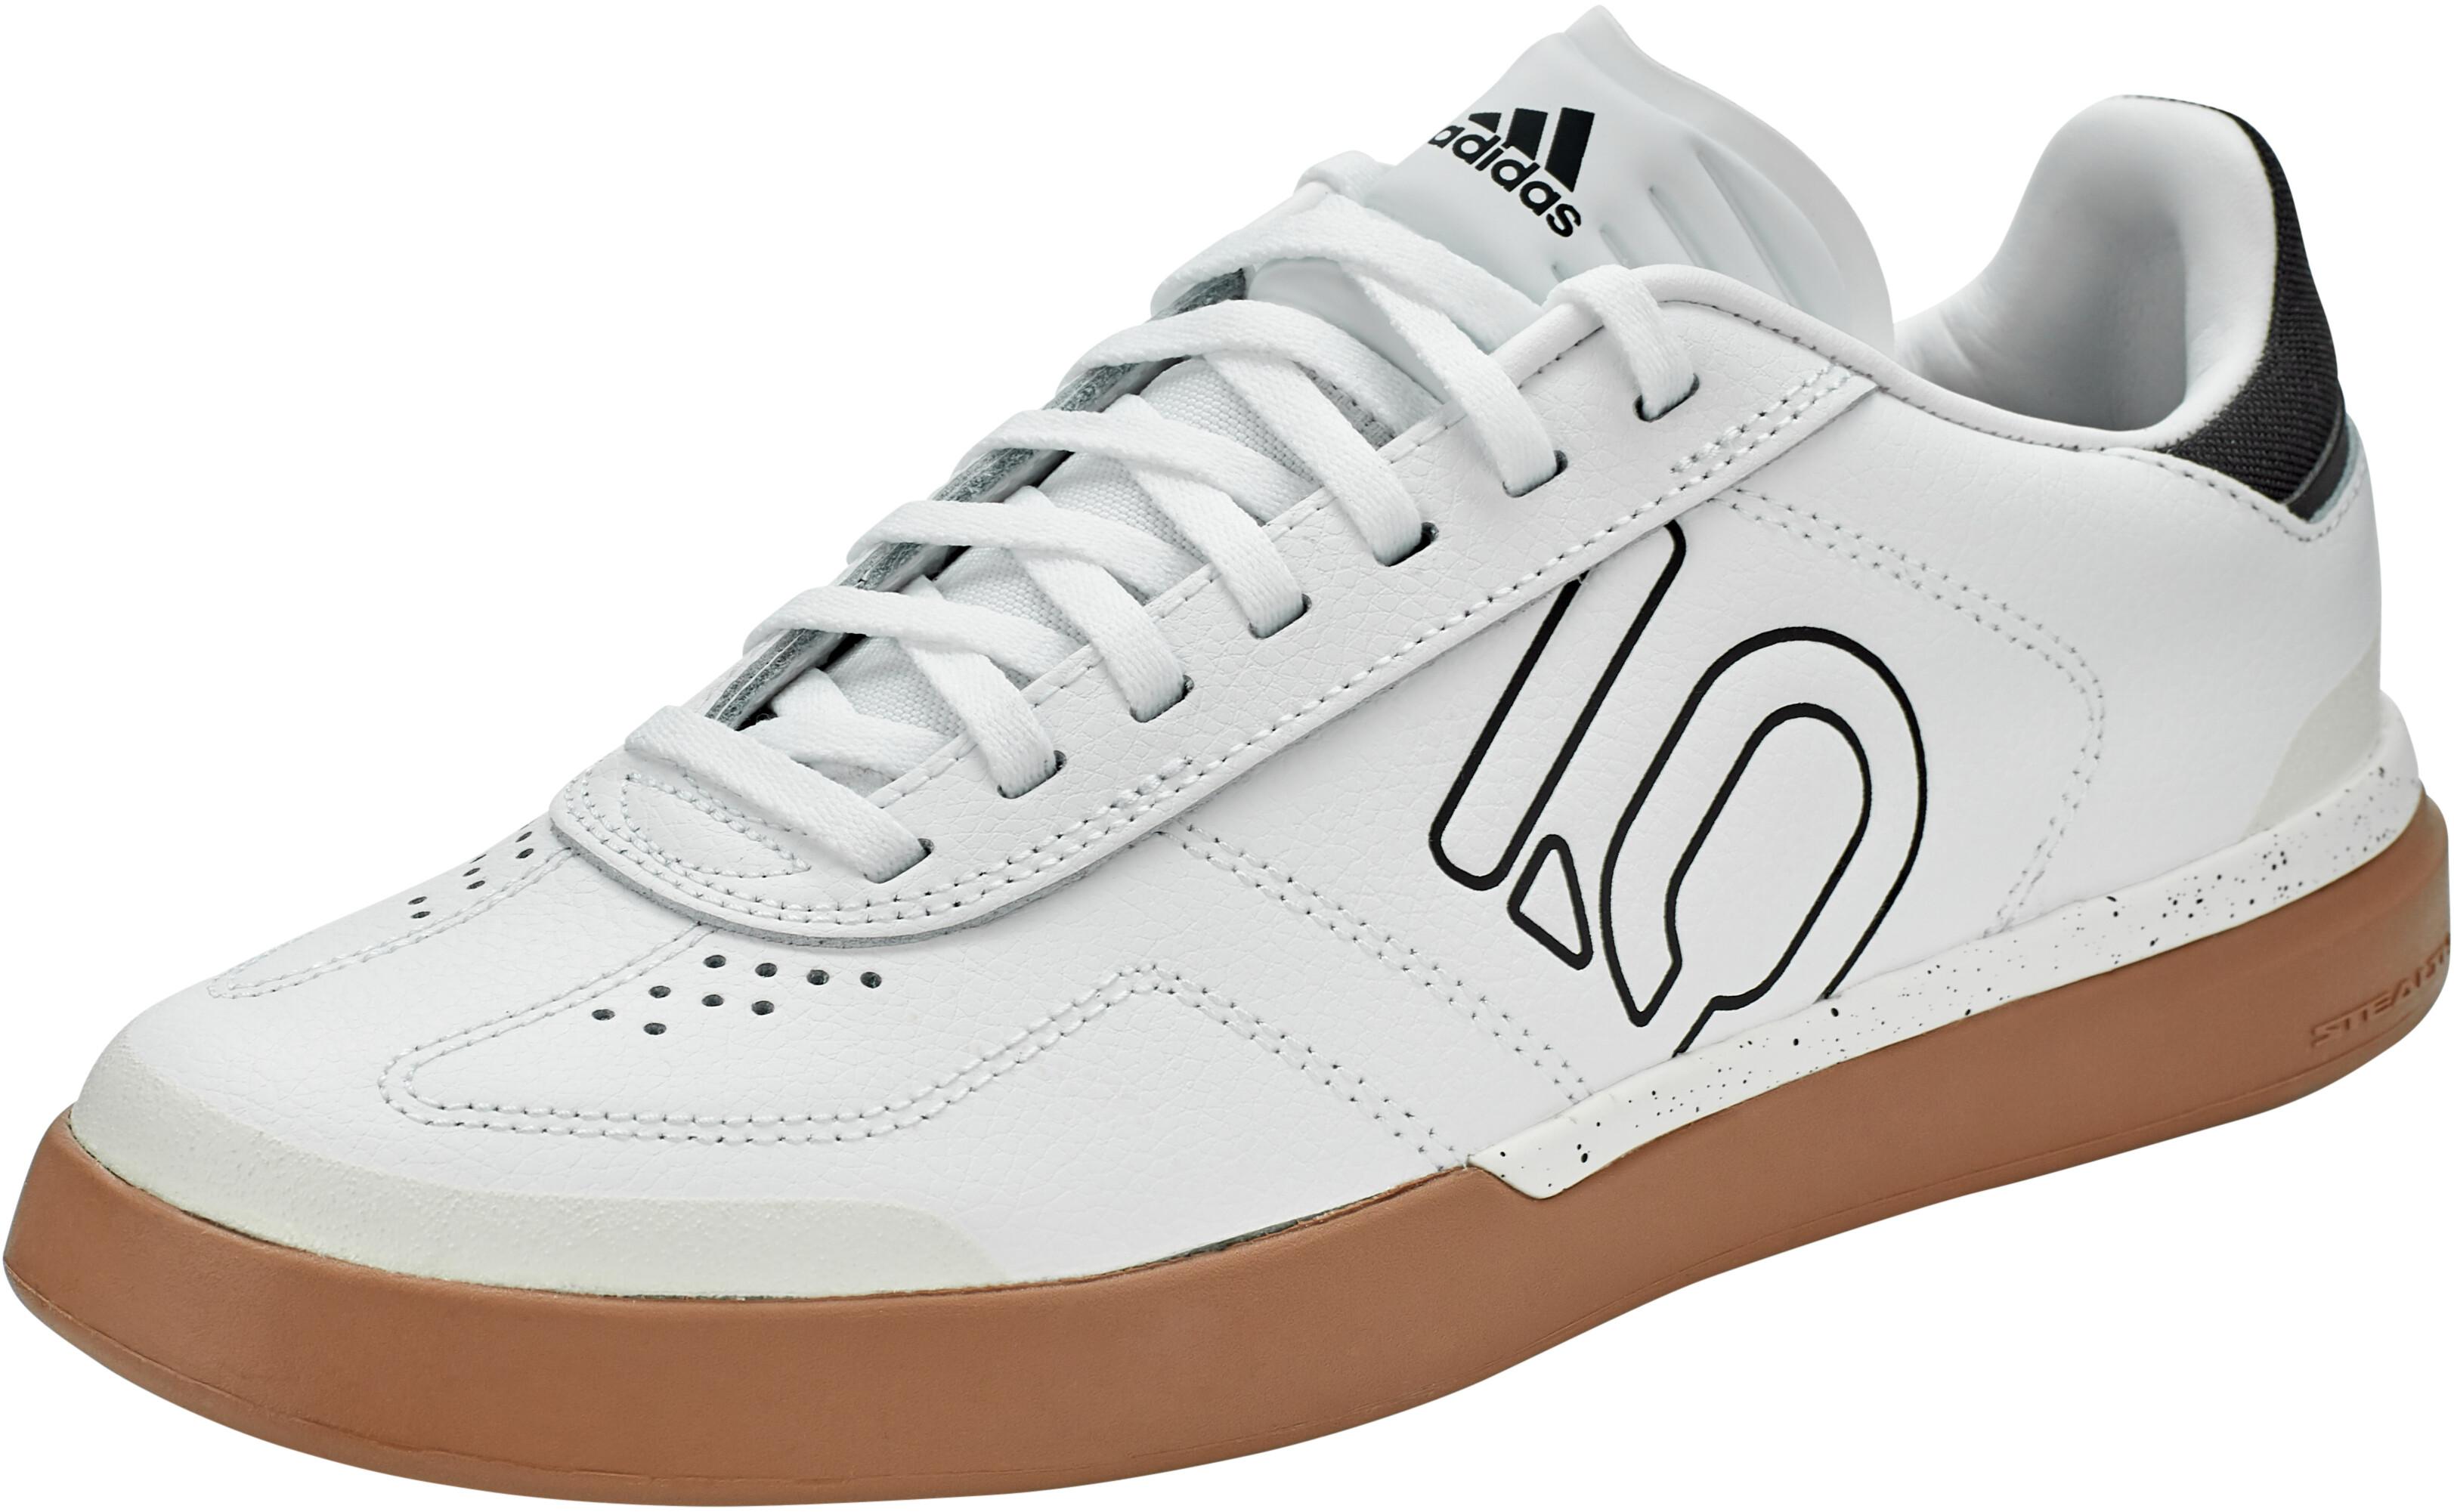 Adidas Five Ten Sleuth Dlx Buty Mtb Mezczyzni Footwear White Core Black Gum M2 Sklep Bikester Pl